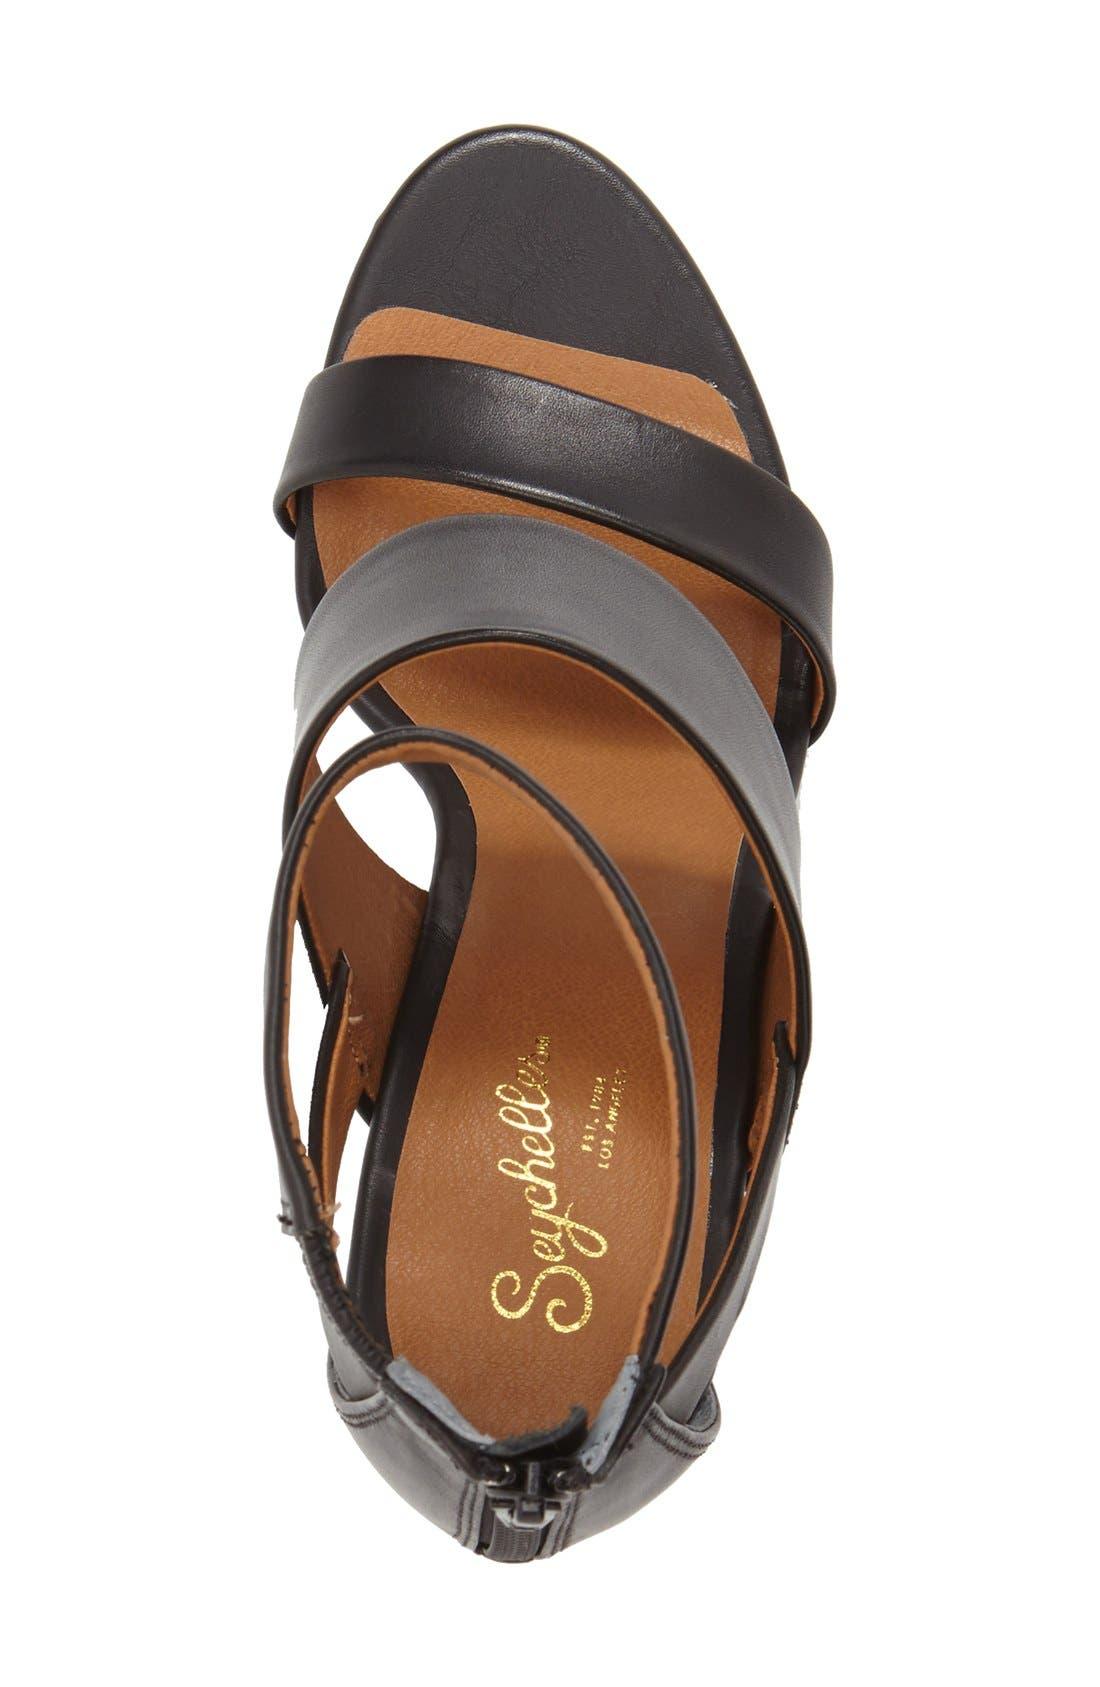 'Suave' Wedge Sandal,                             Alternate thumbnail 4, color,                             001